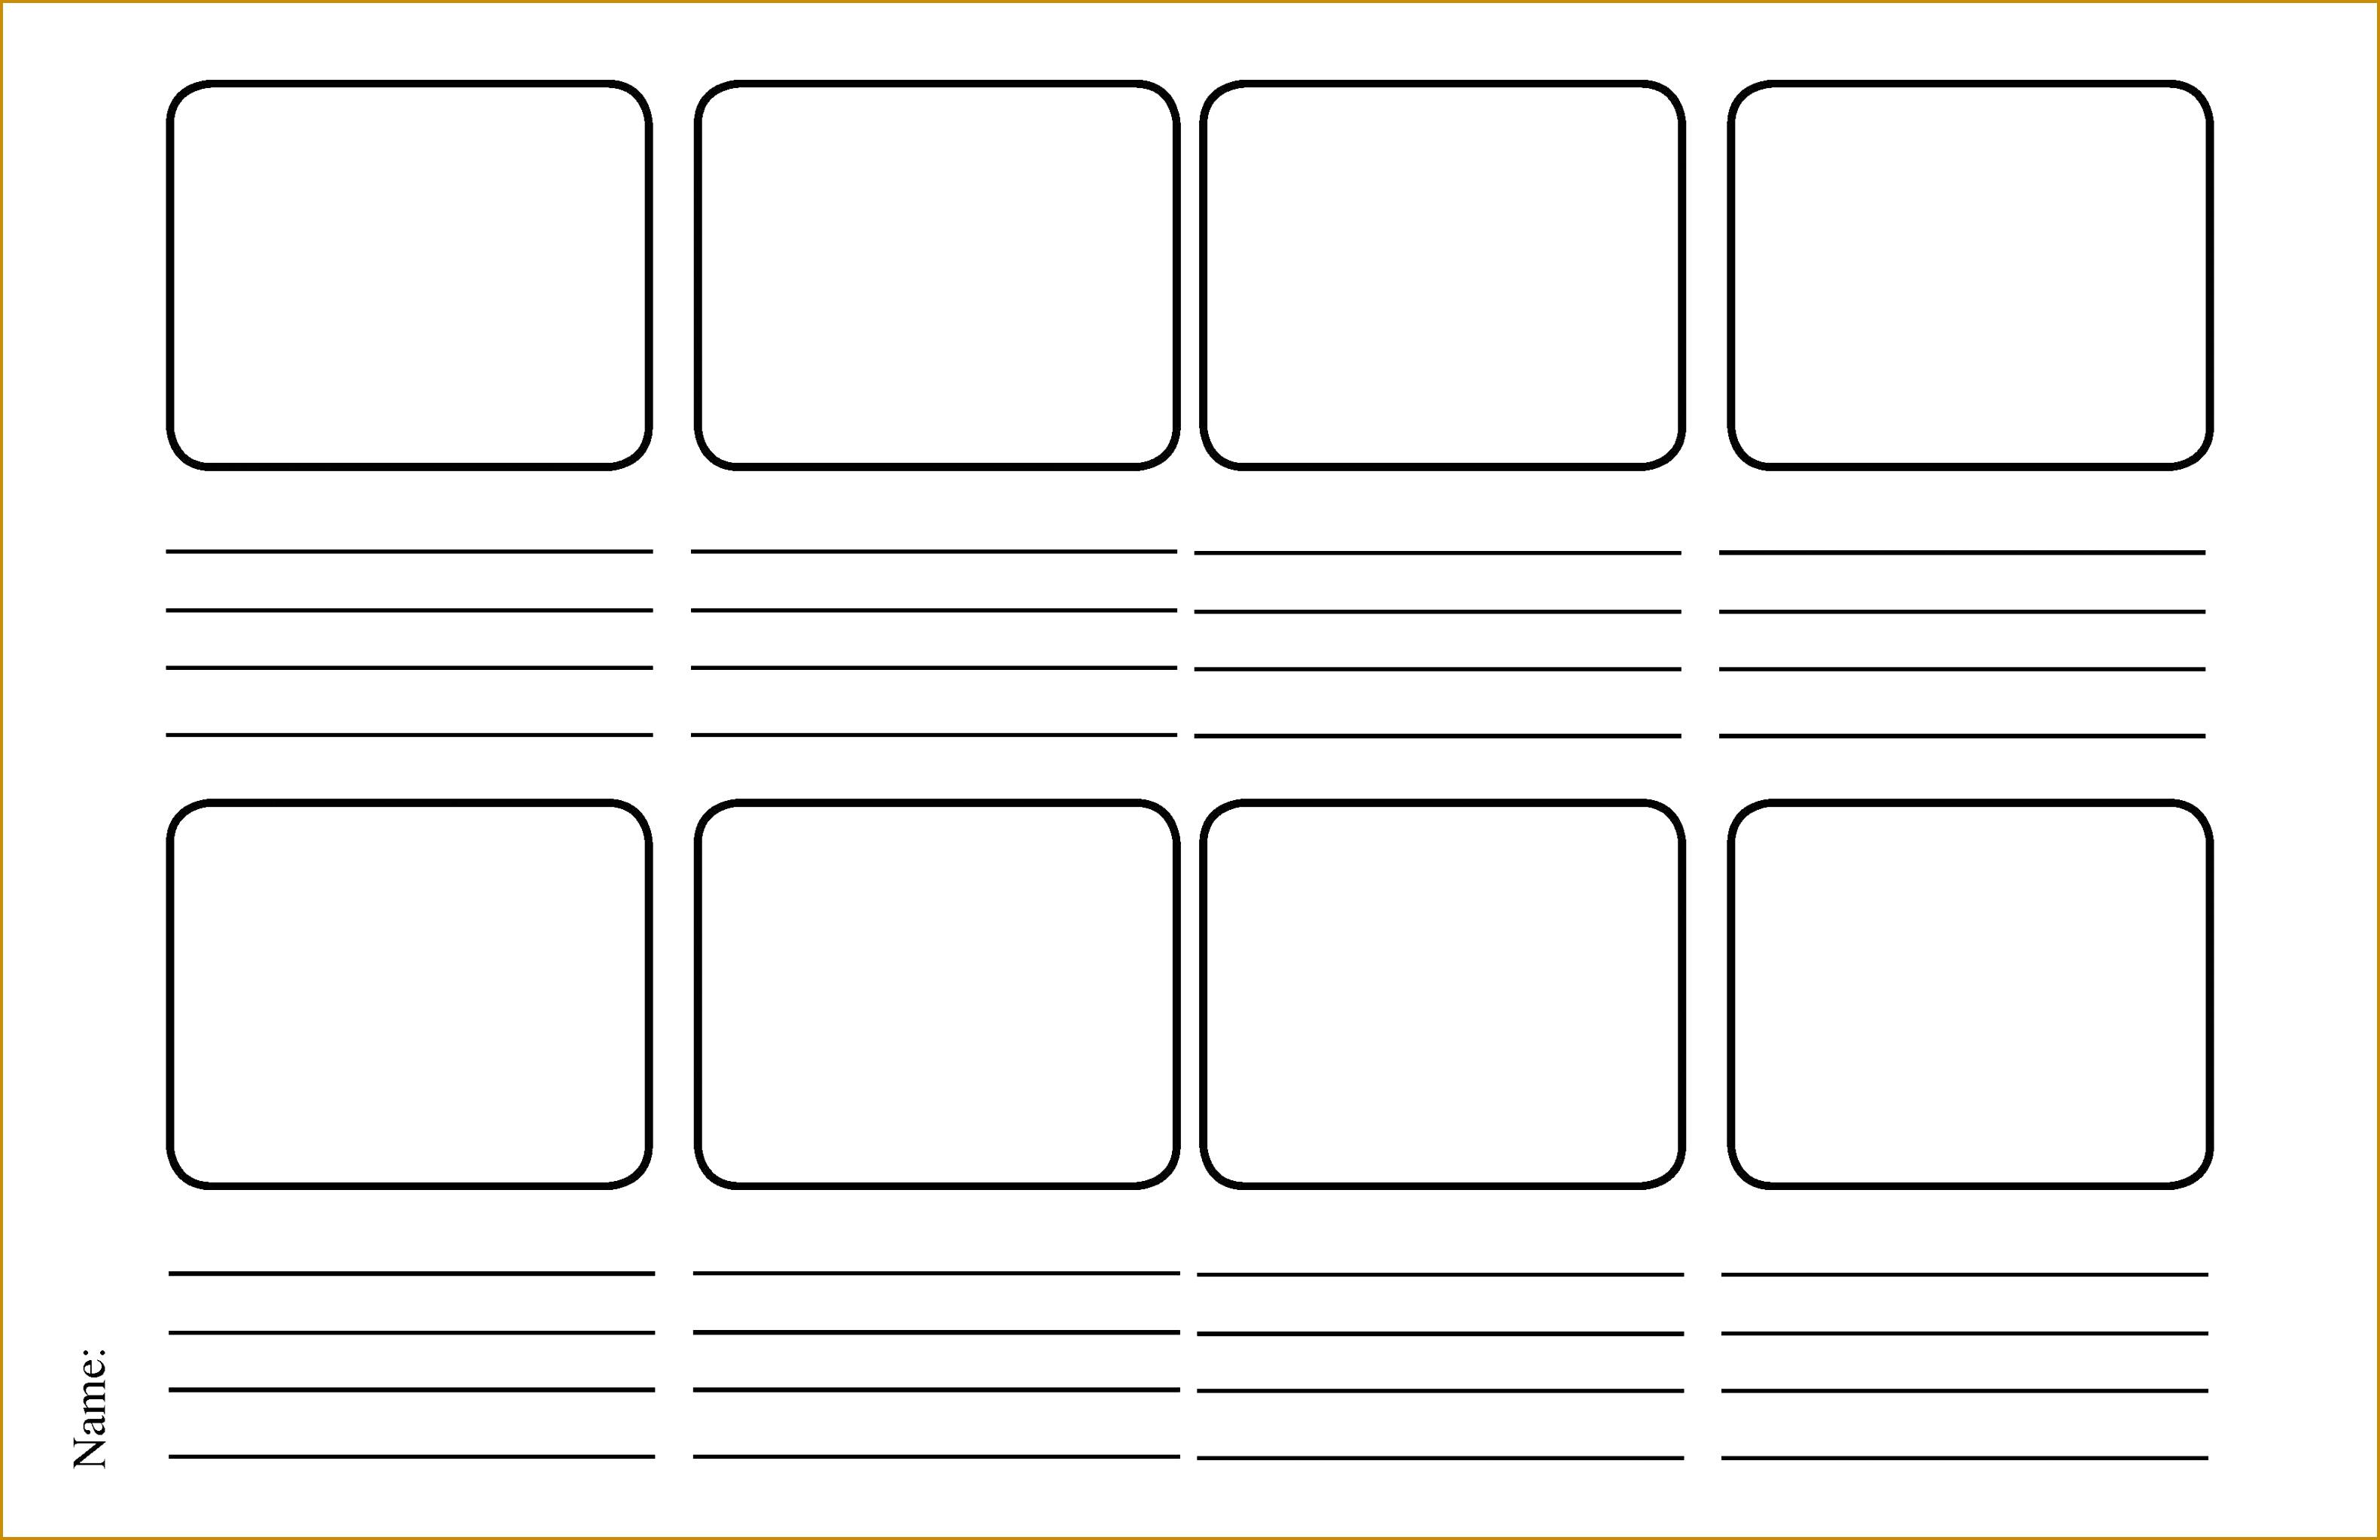 Storyboard template doliquid storyboard template maxwellsz 20463162